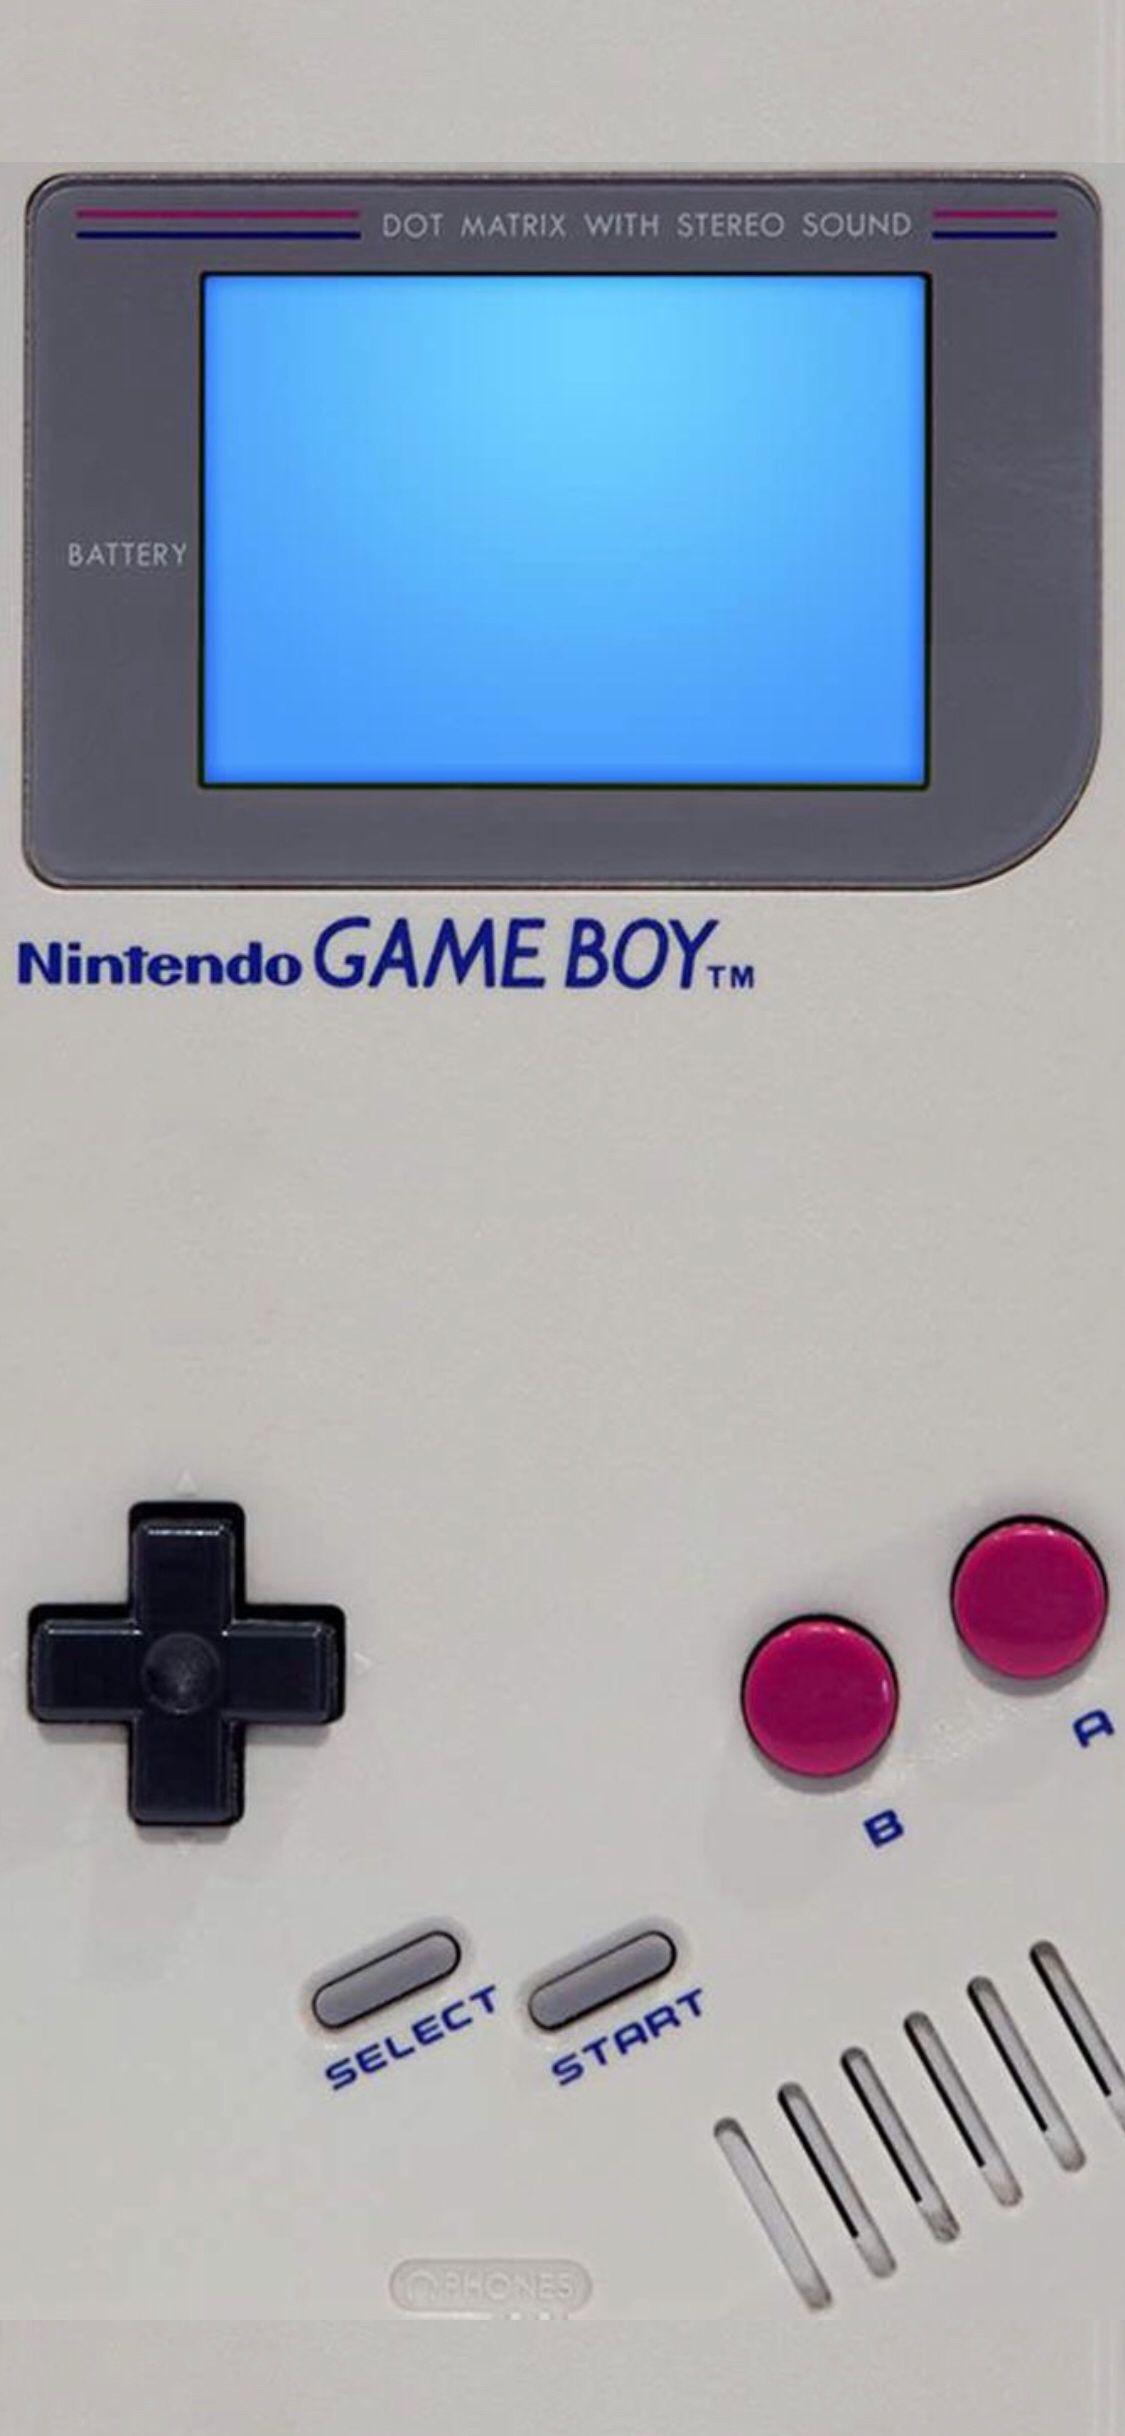 Game Boy Wallpaper Iphone X Ipod Wallpaper Boys Wallpaper Gameboy